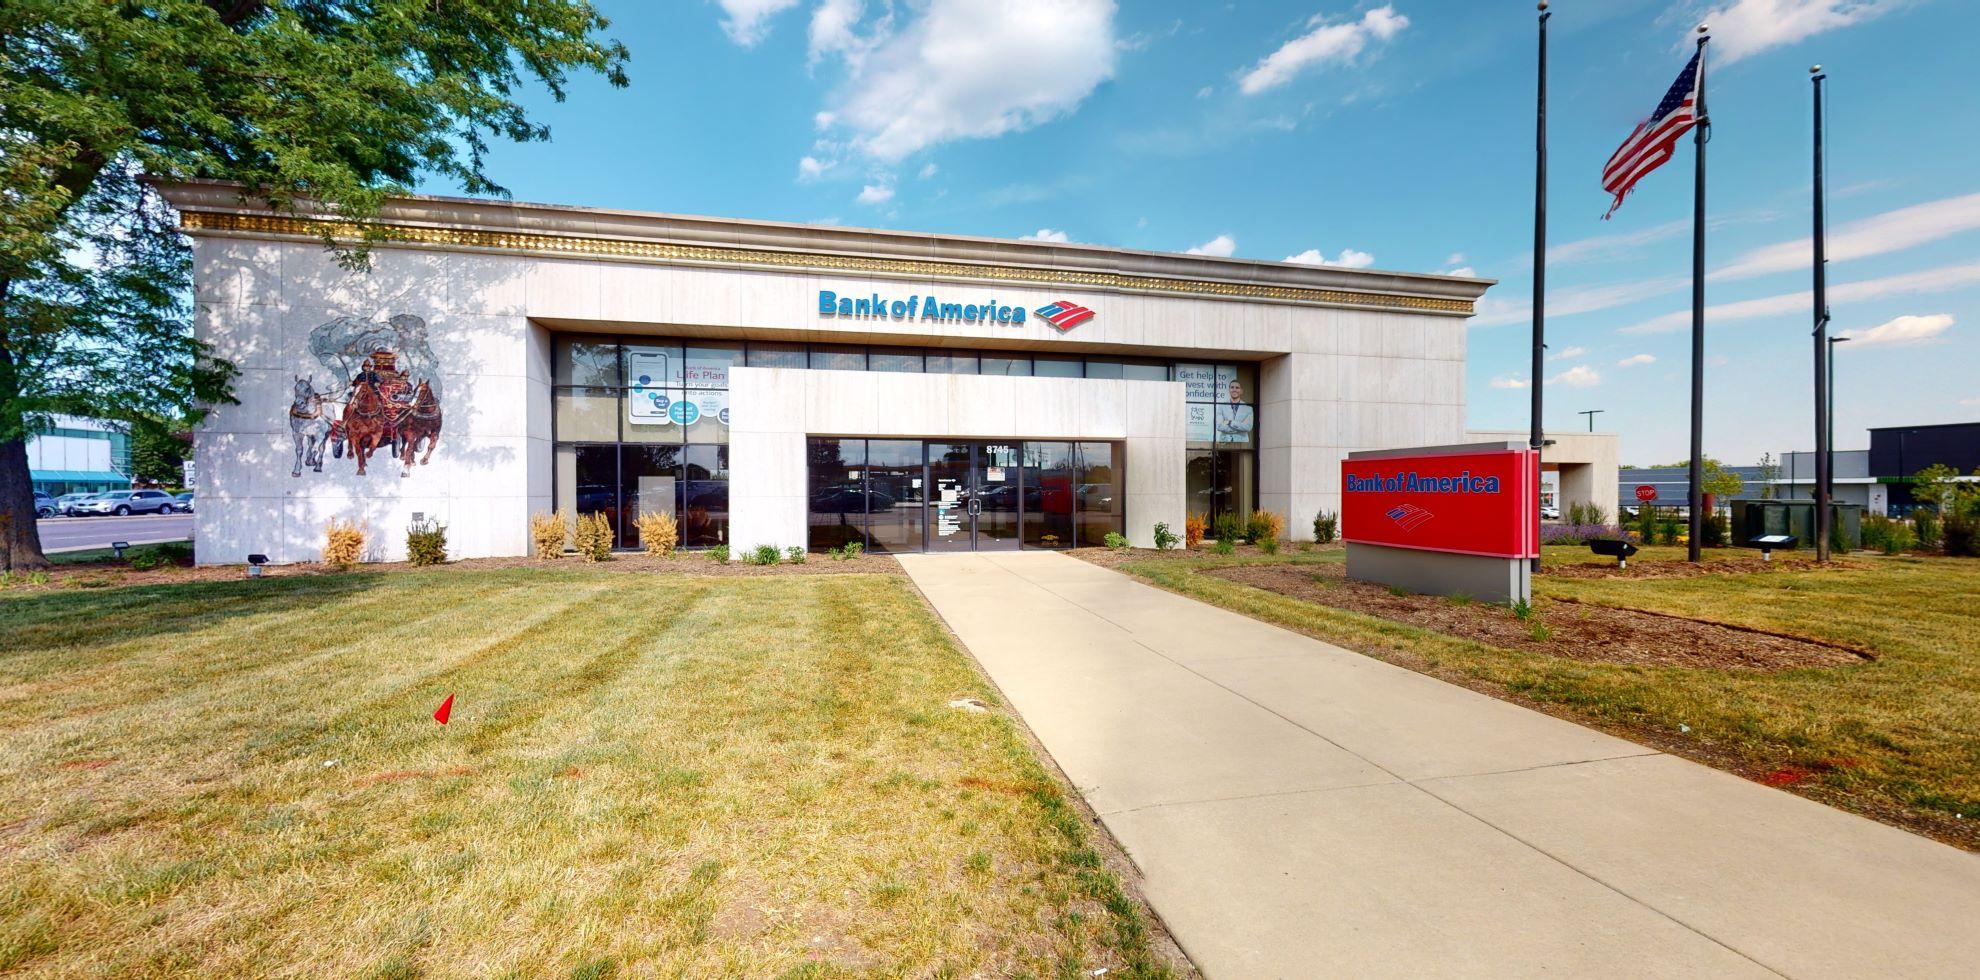 Bank of America financial center with drive-thru ATM | 8745 Waukegan Rd, Morton Grove, IL 60053